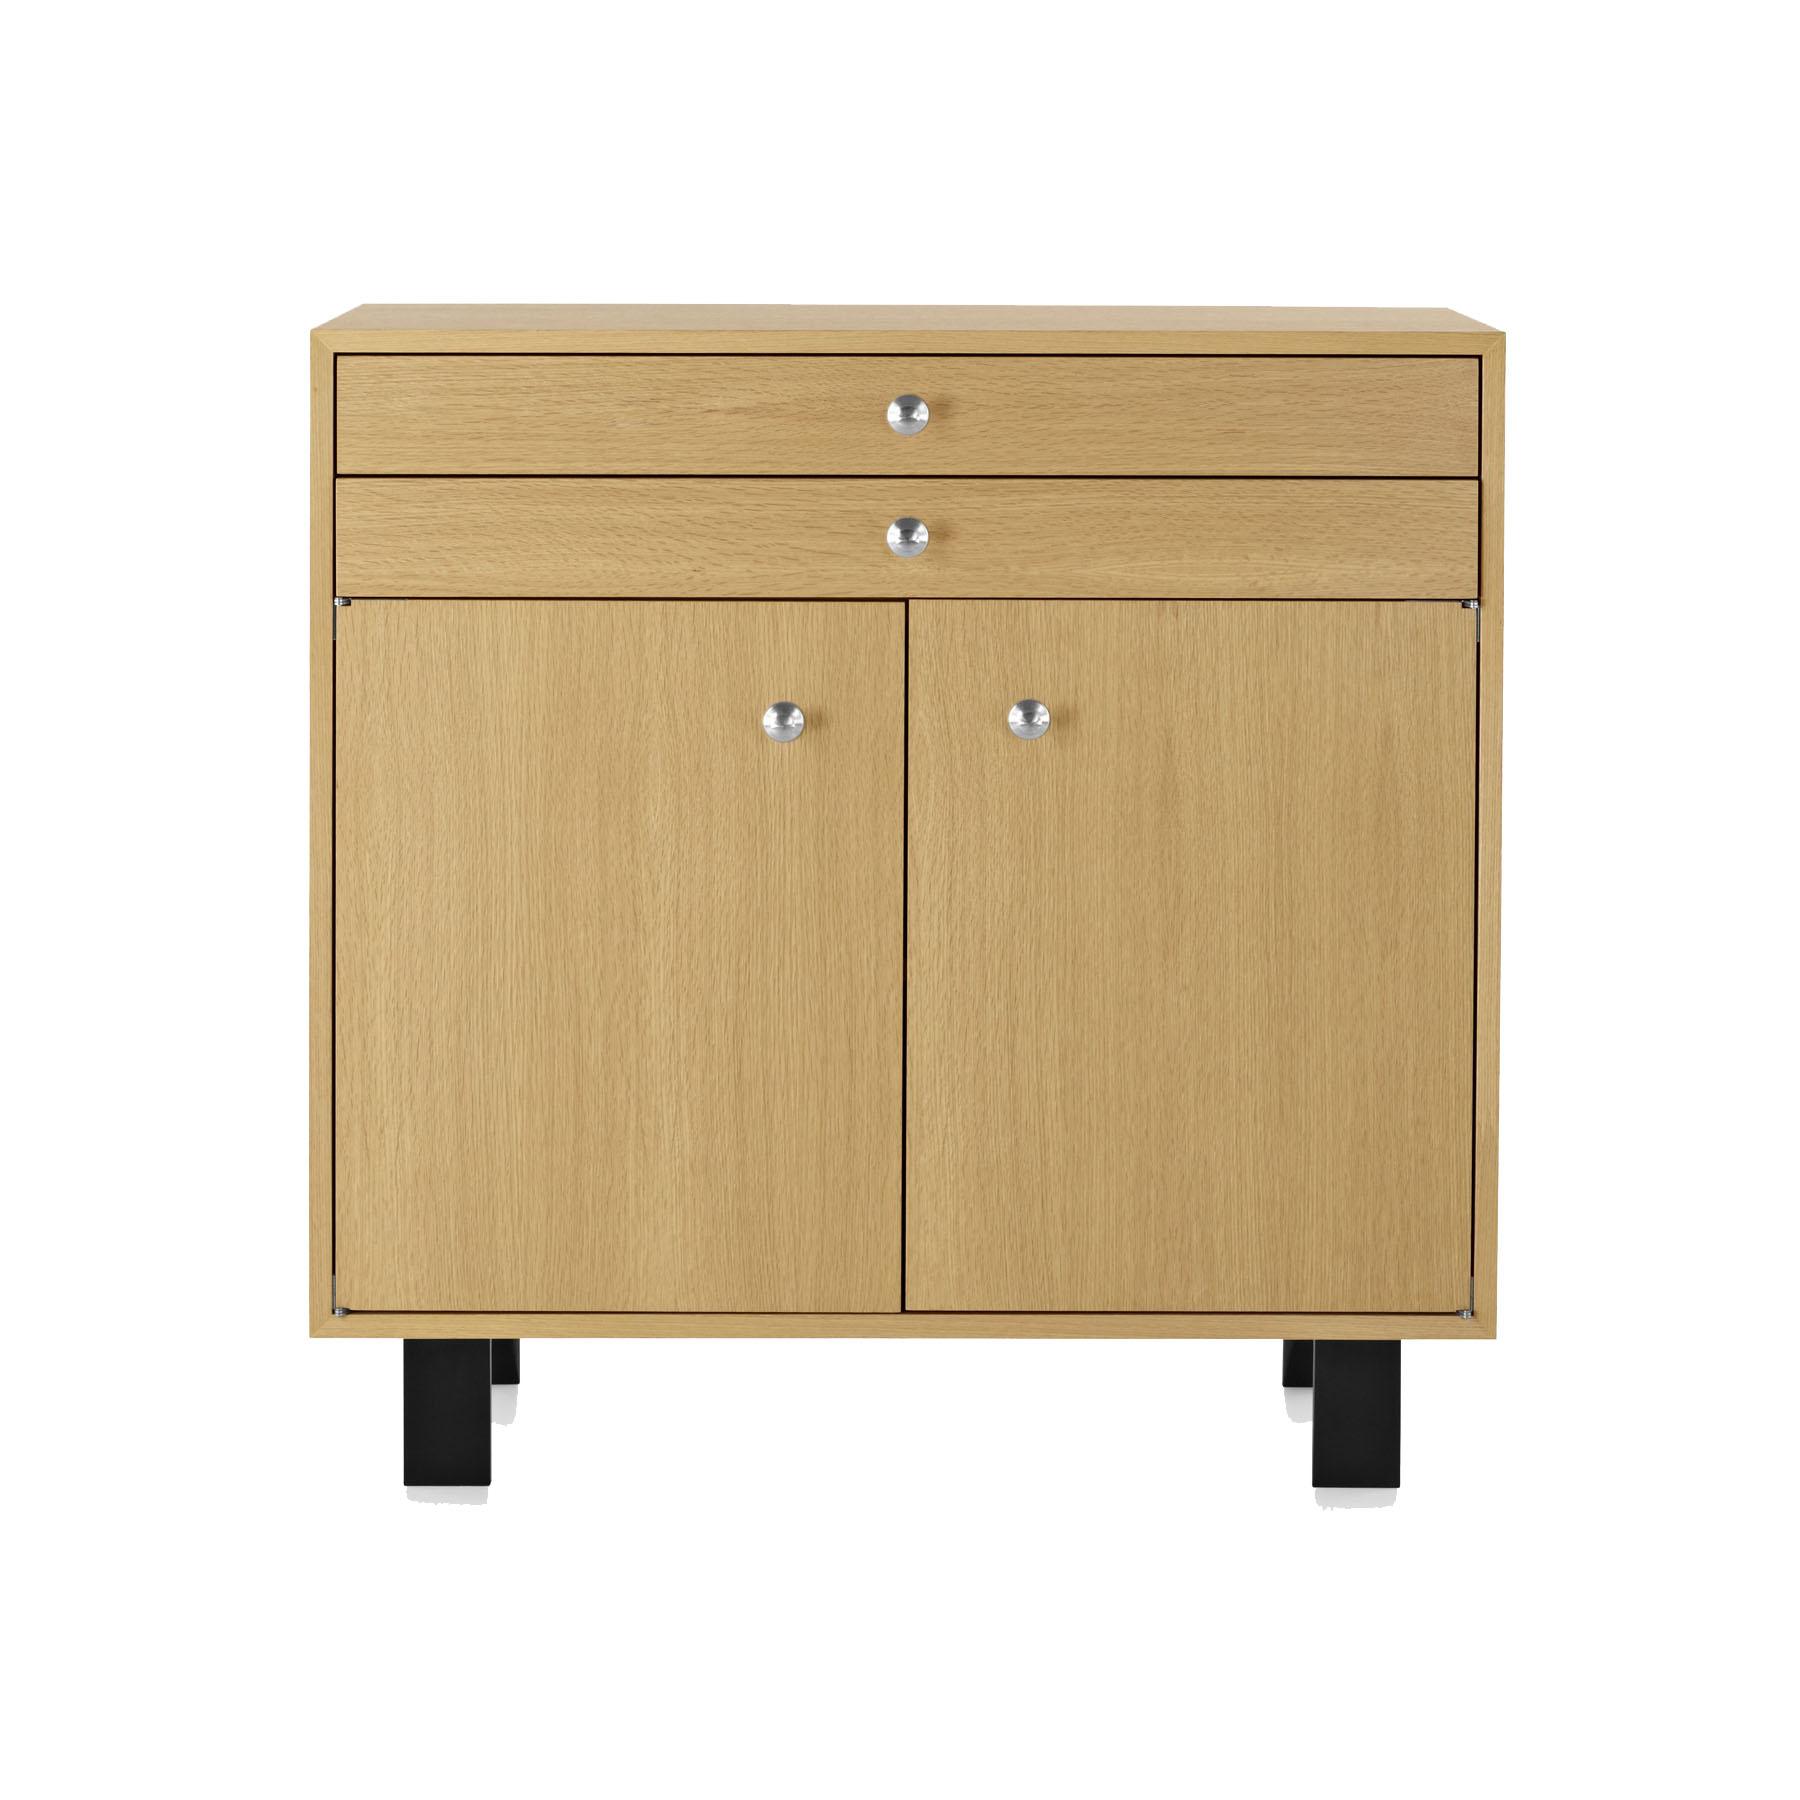 Rta Kitchen Cabinets Toronto: Herman Miller Storage Nelson Basic